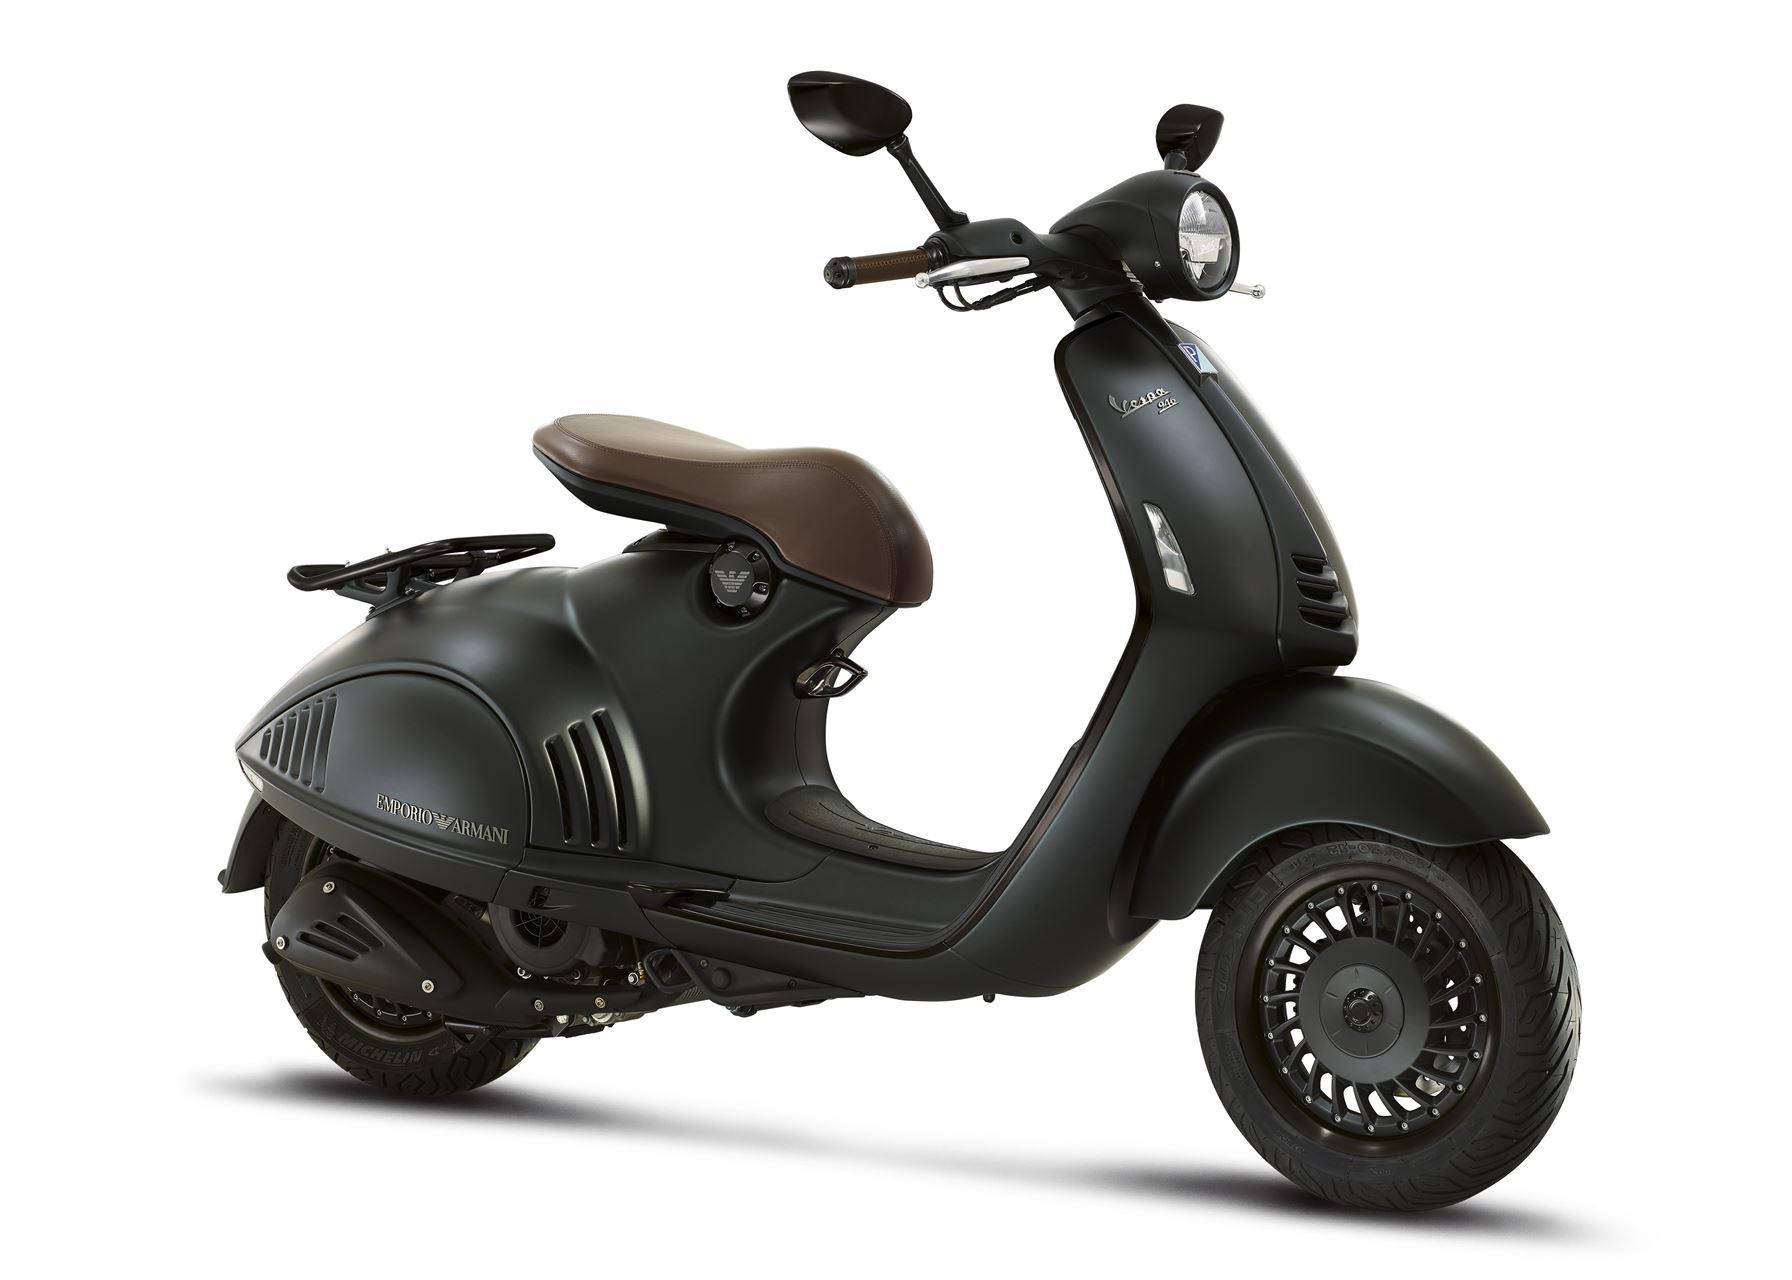 Vespa 946 125 Ea Abs Scooter Gama 125cc Lombas E Curvas